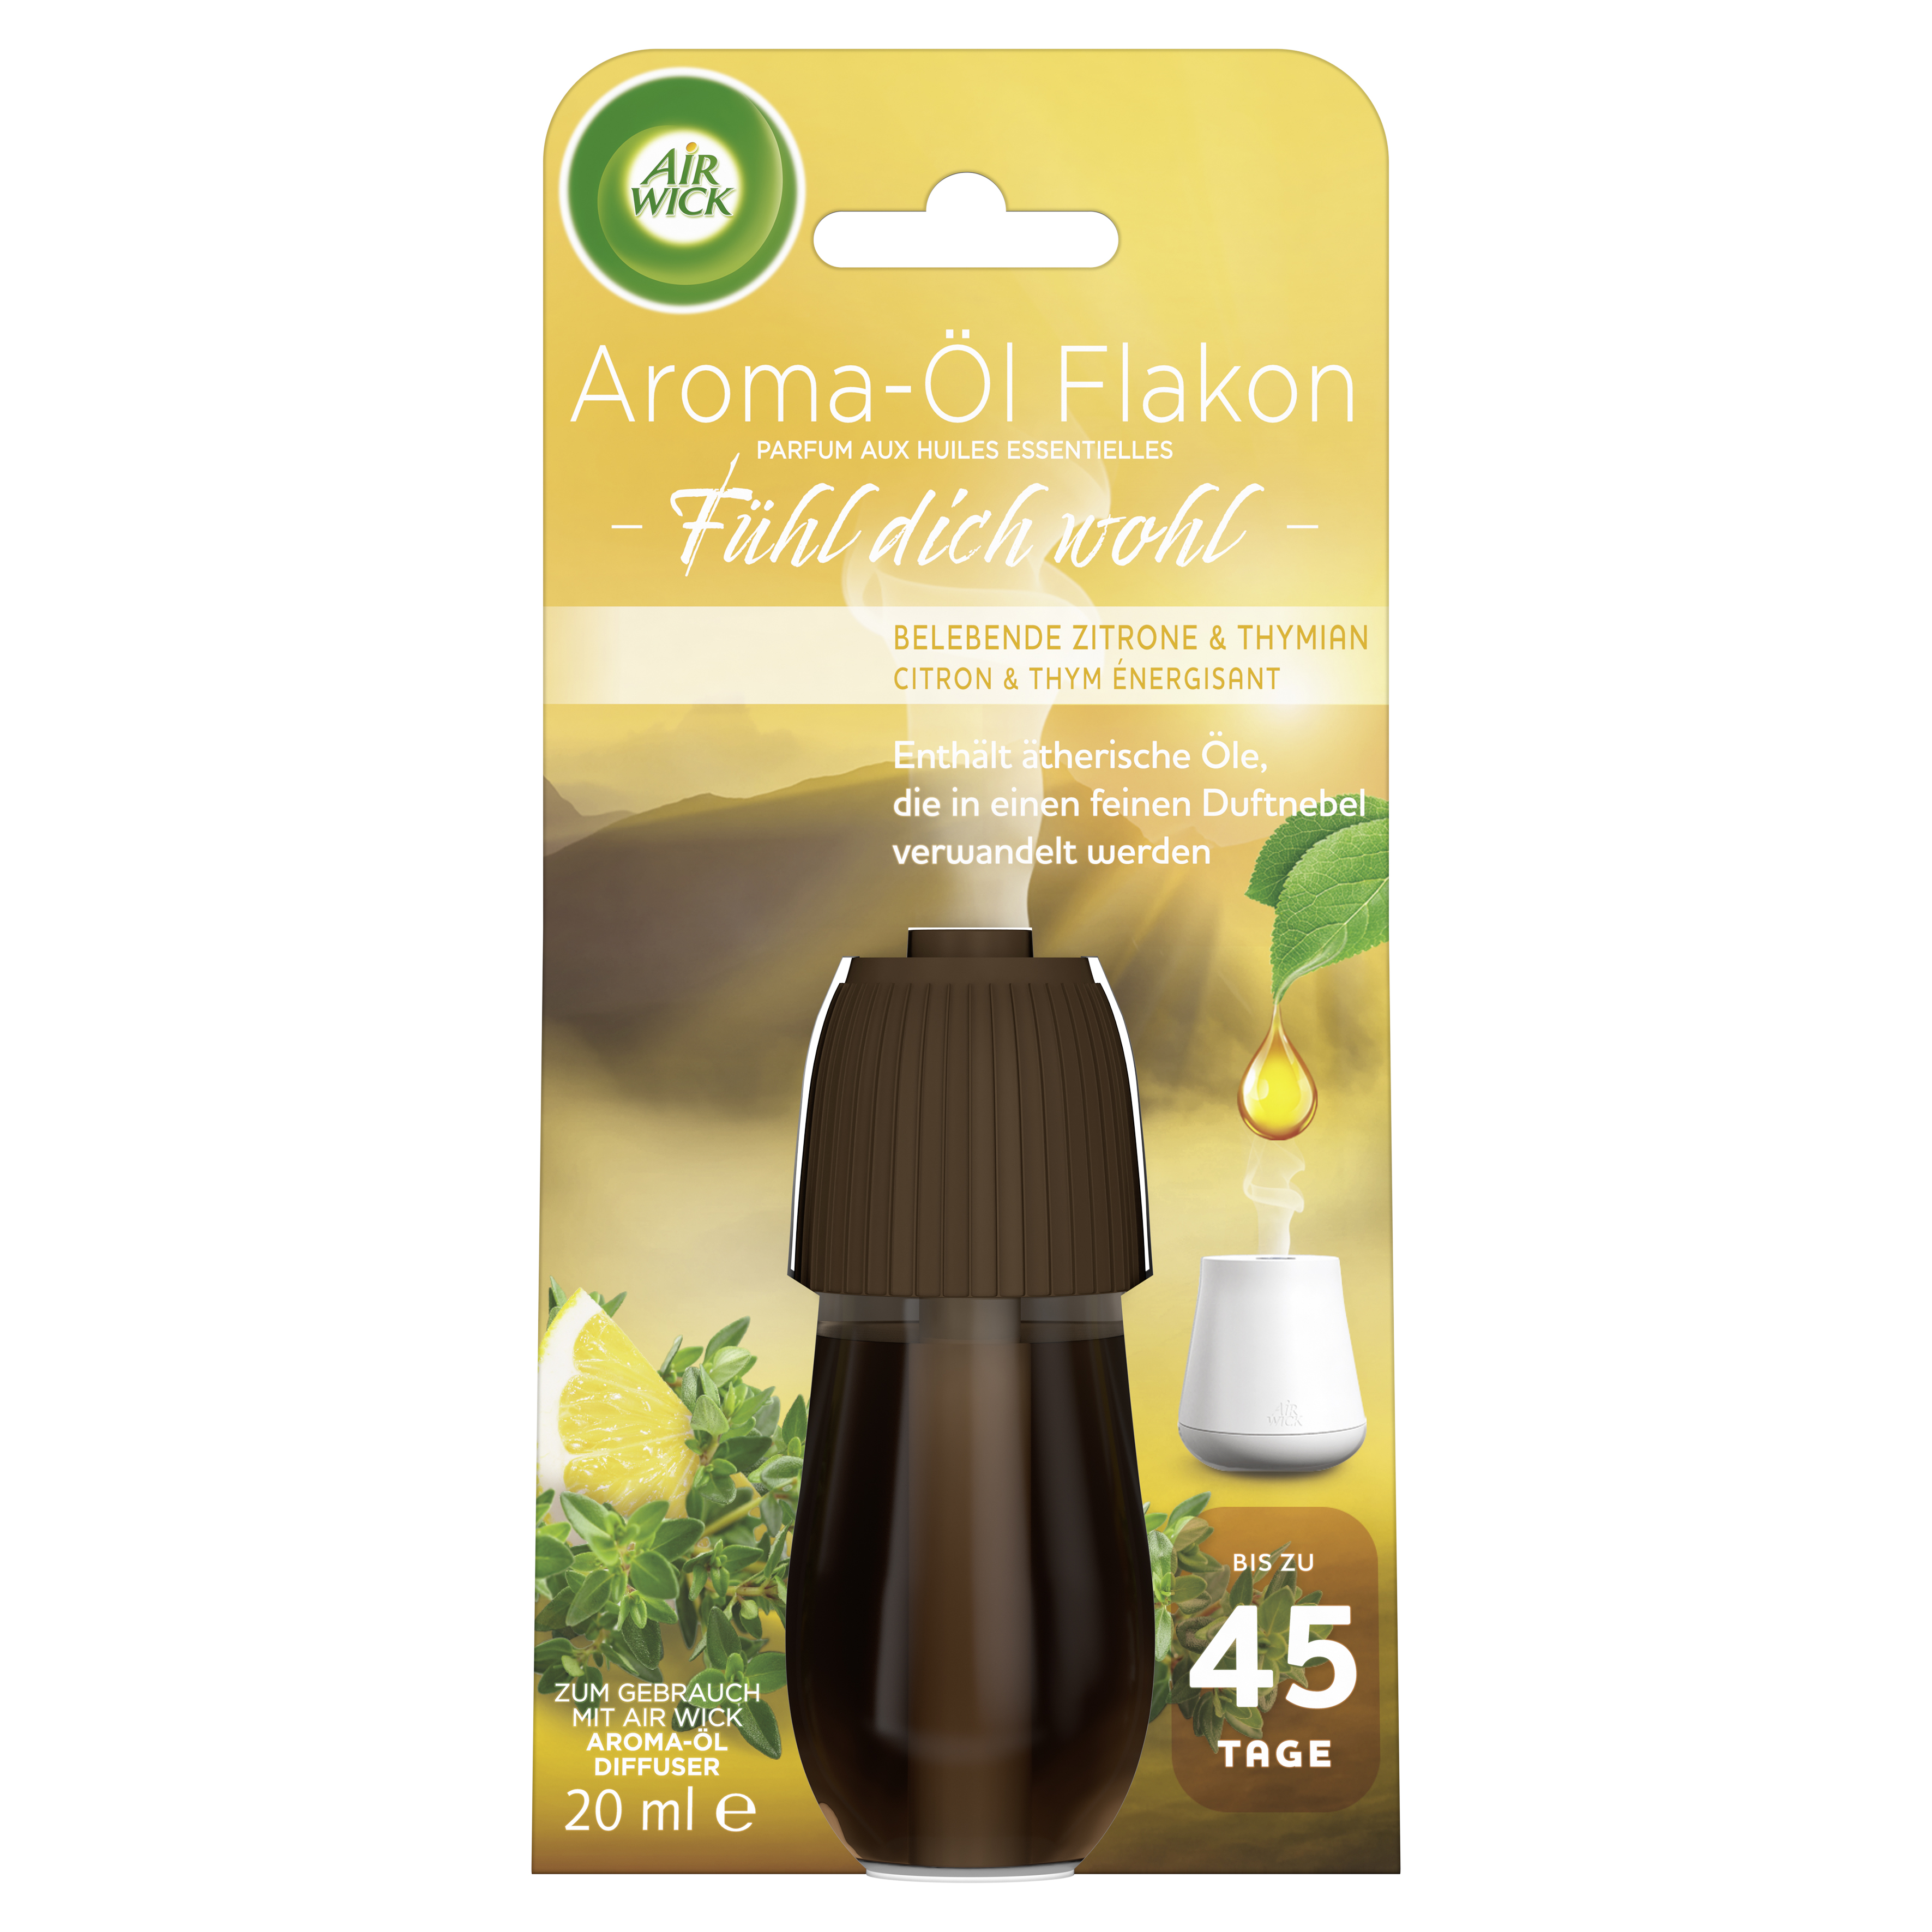 Air Wick Aroma-Öl Flakon Belebende Zitrone & Thymian